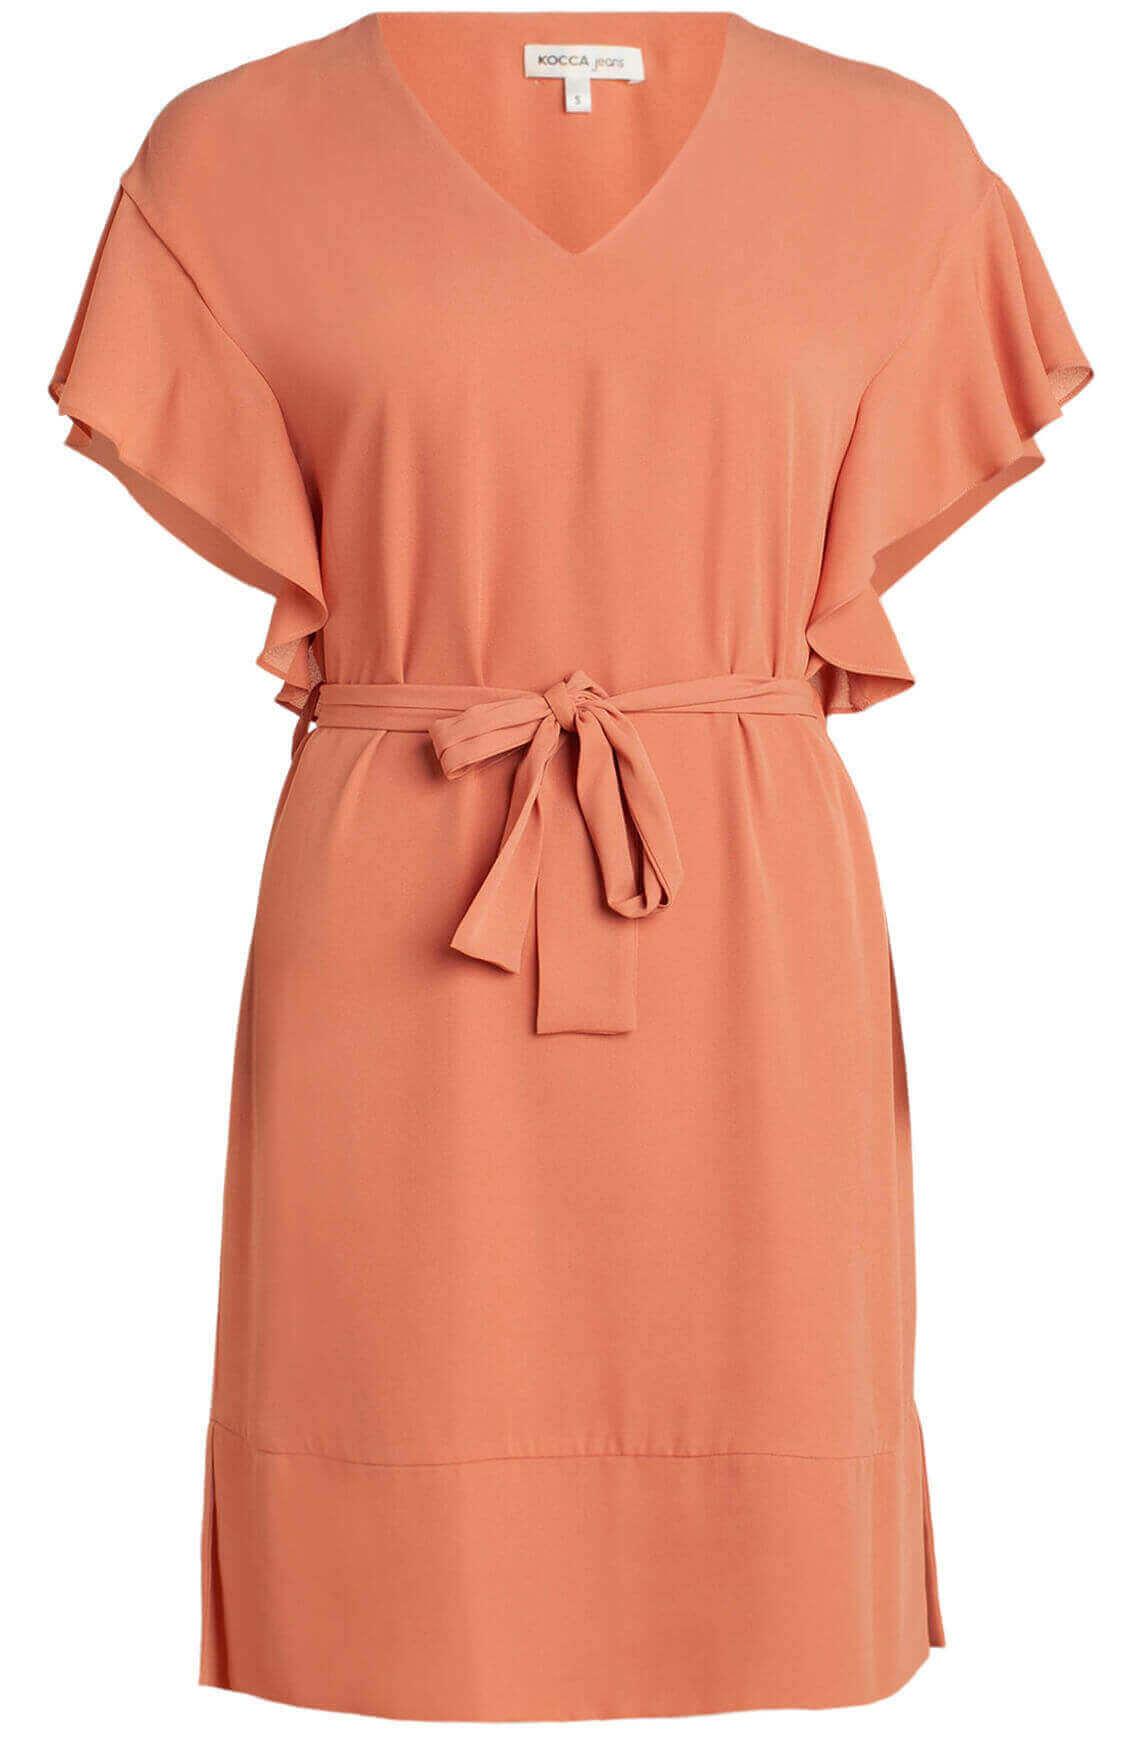 Kocca Dames Lifana jurk met ruches roze